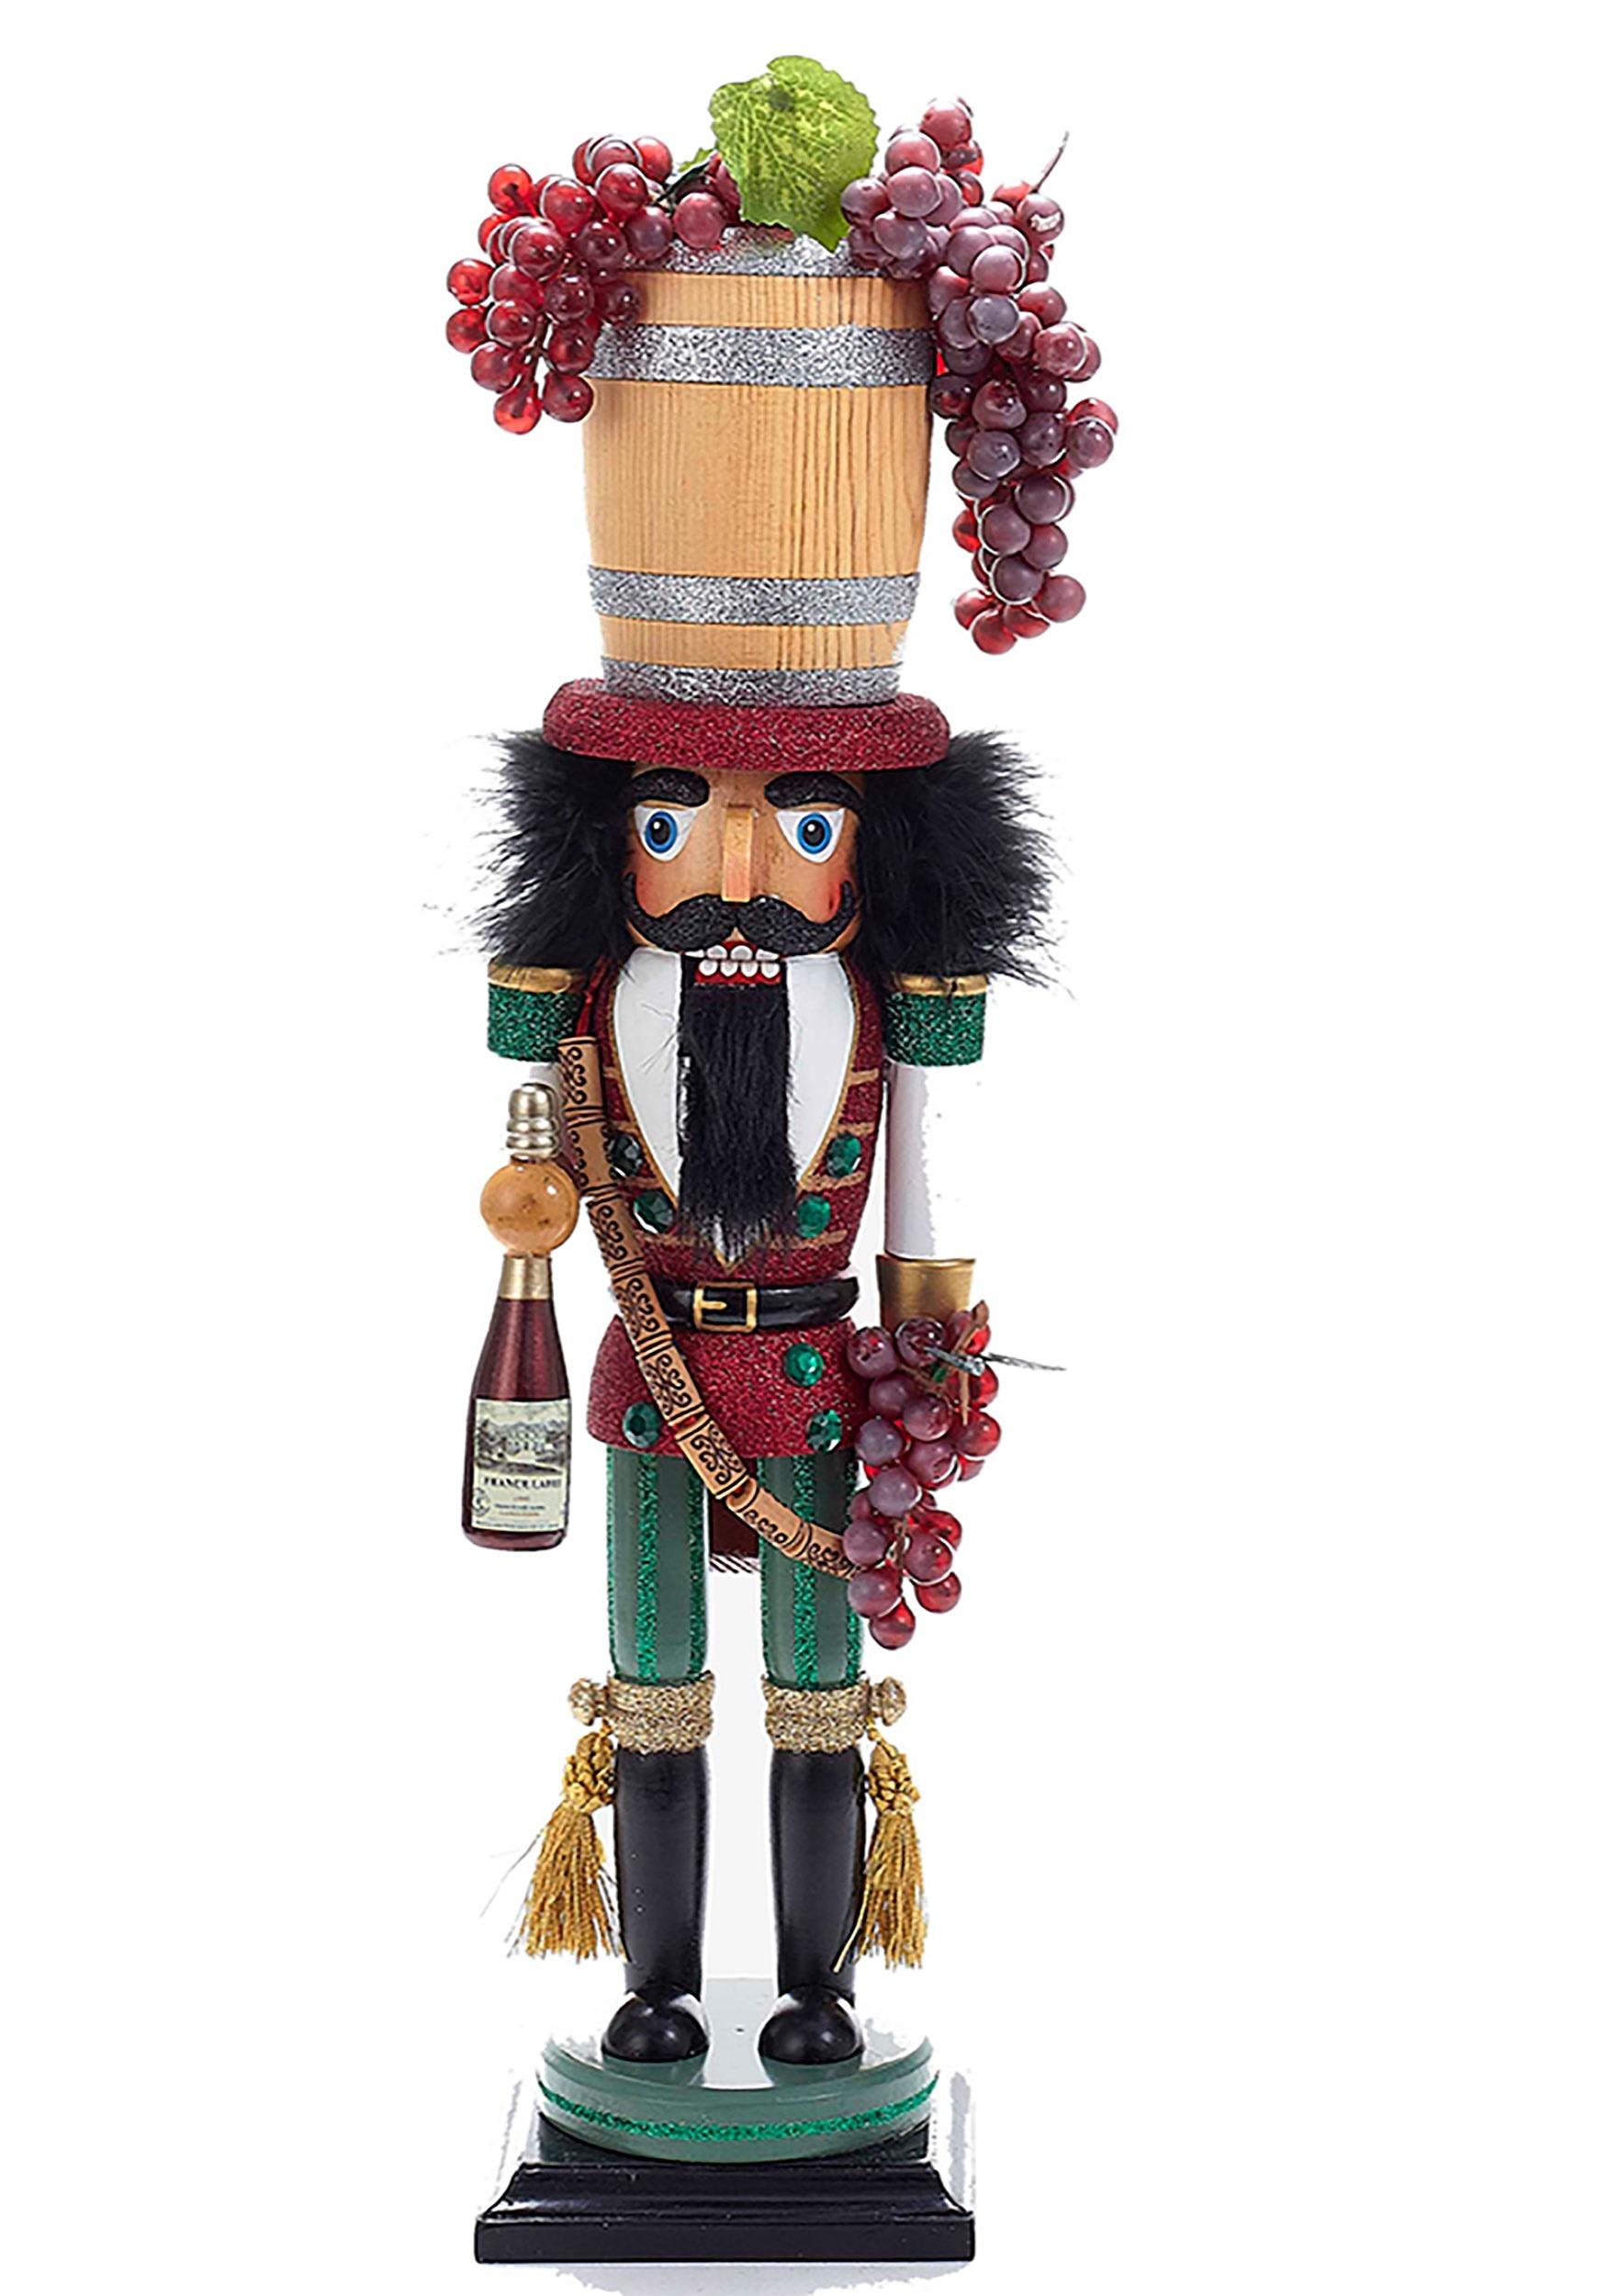 189 Holly Wood Wood Wine Barrel Hat Nutcracker